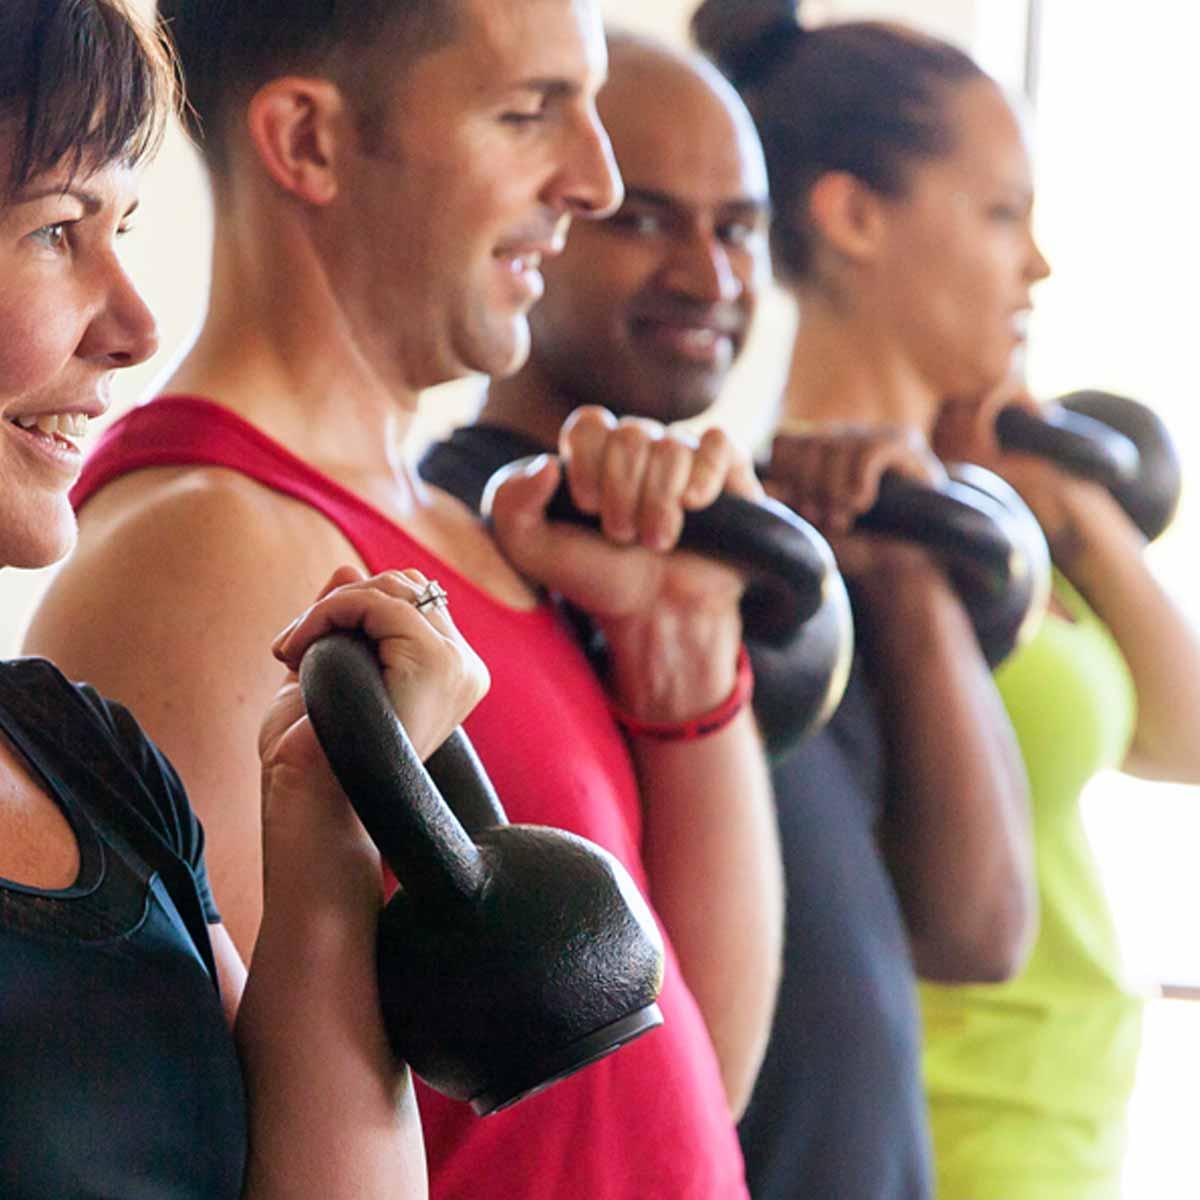 rebirth-community-support-fitness